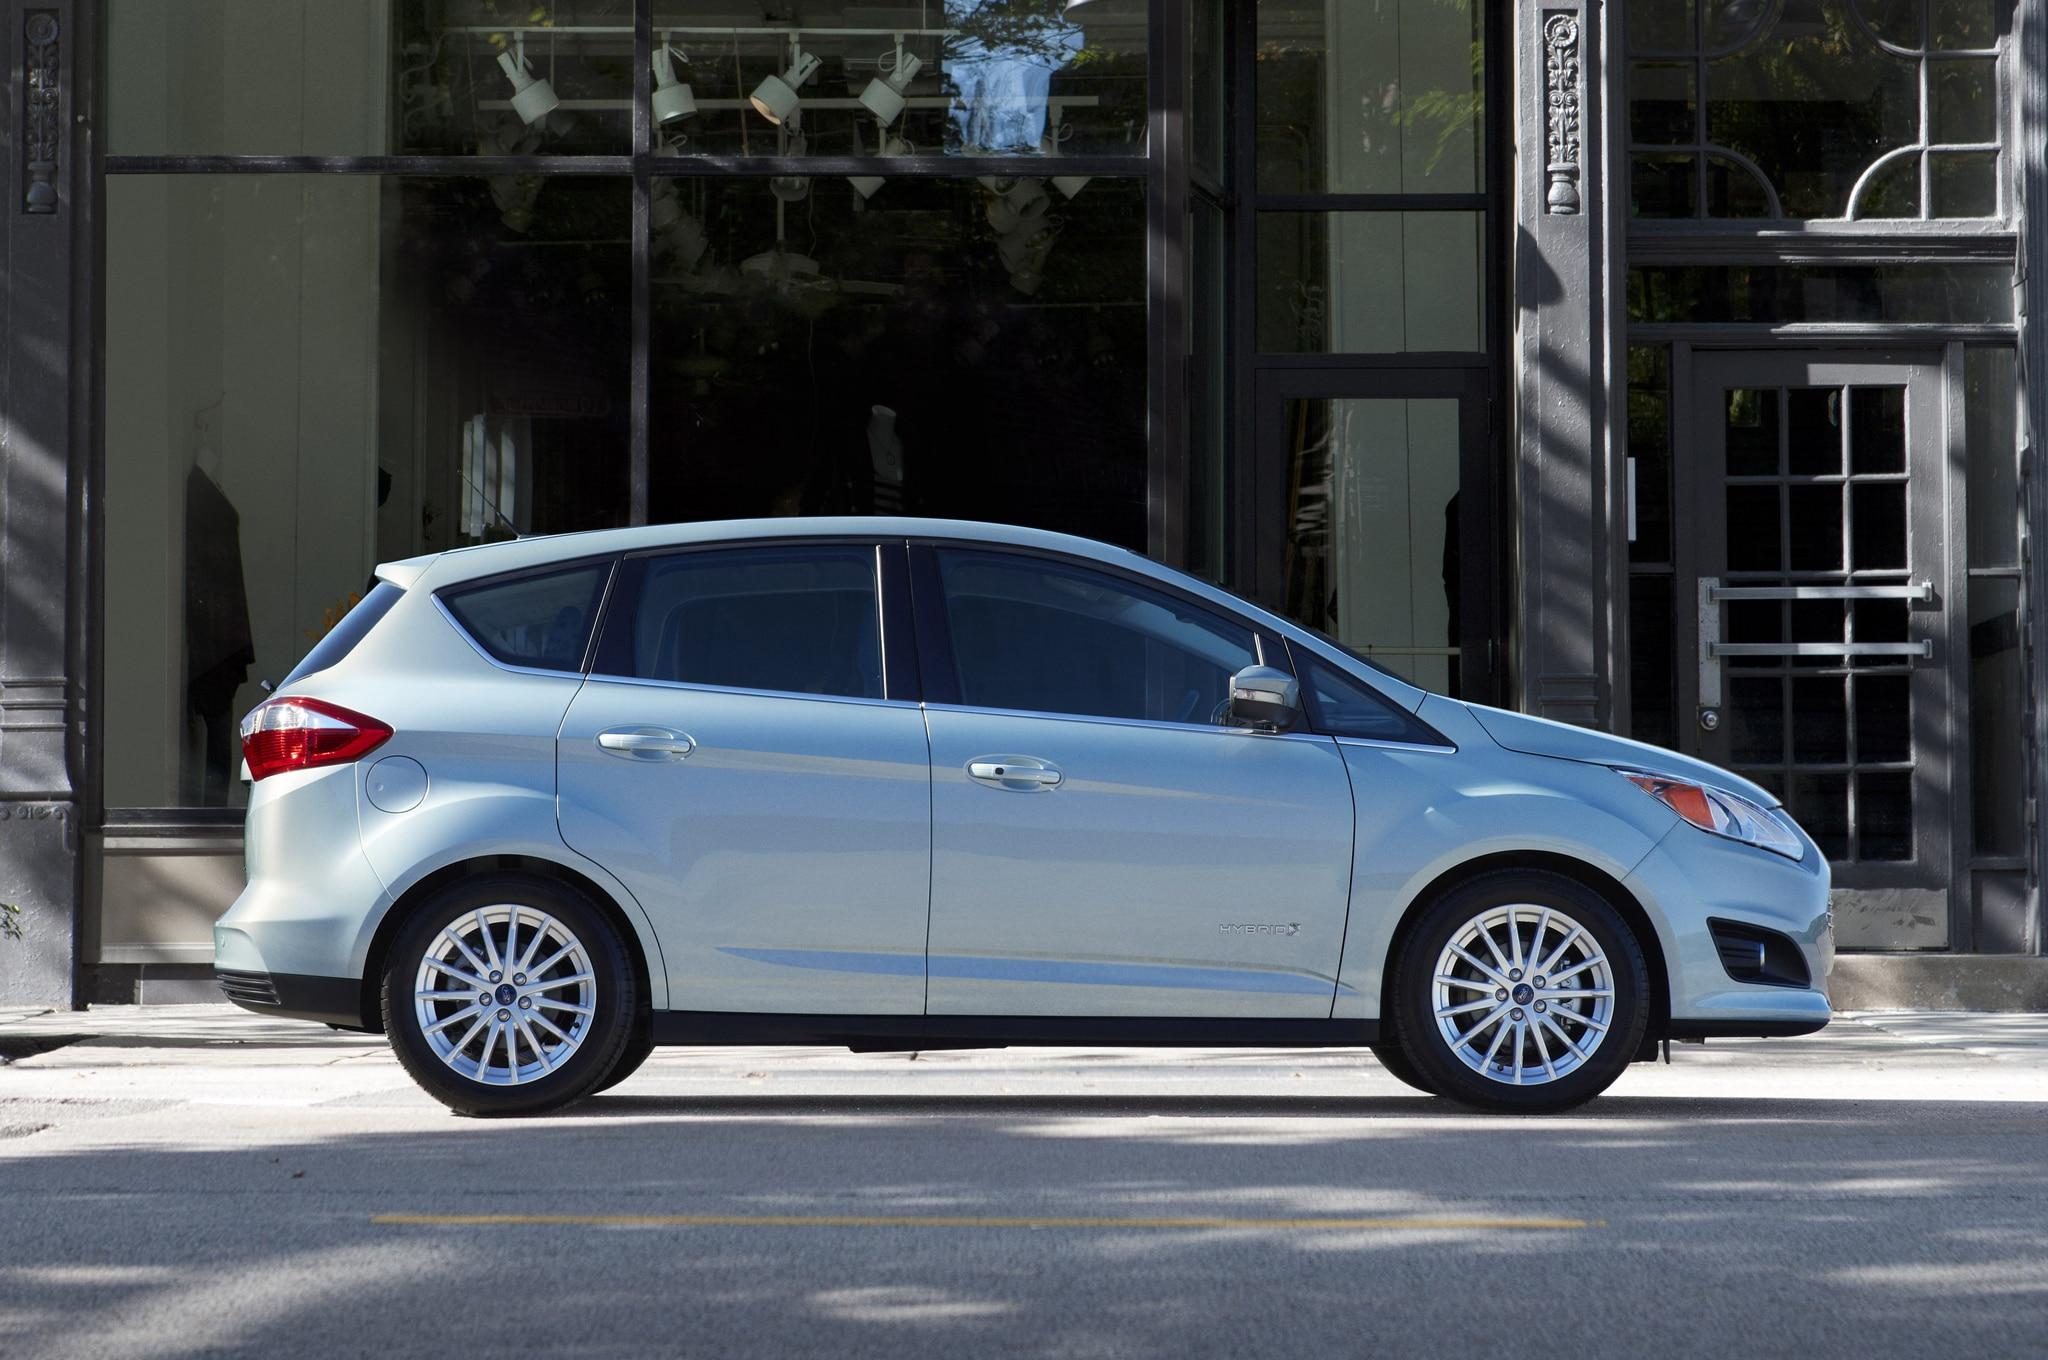 2013 Ford C Max Hybrid Profile1